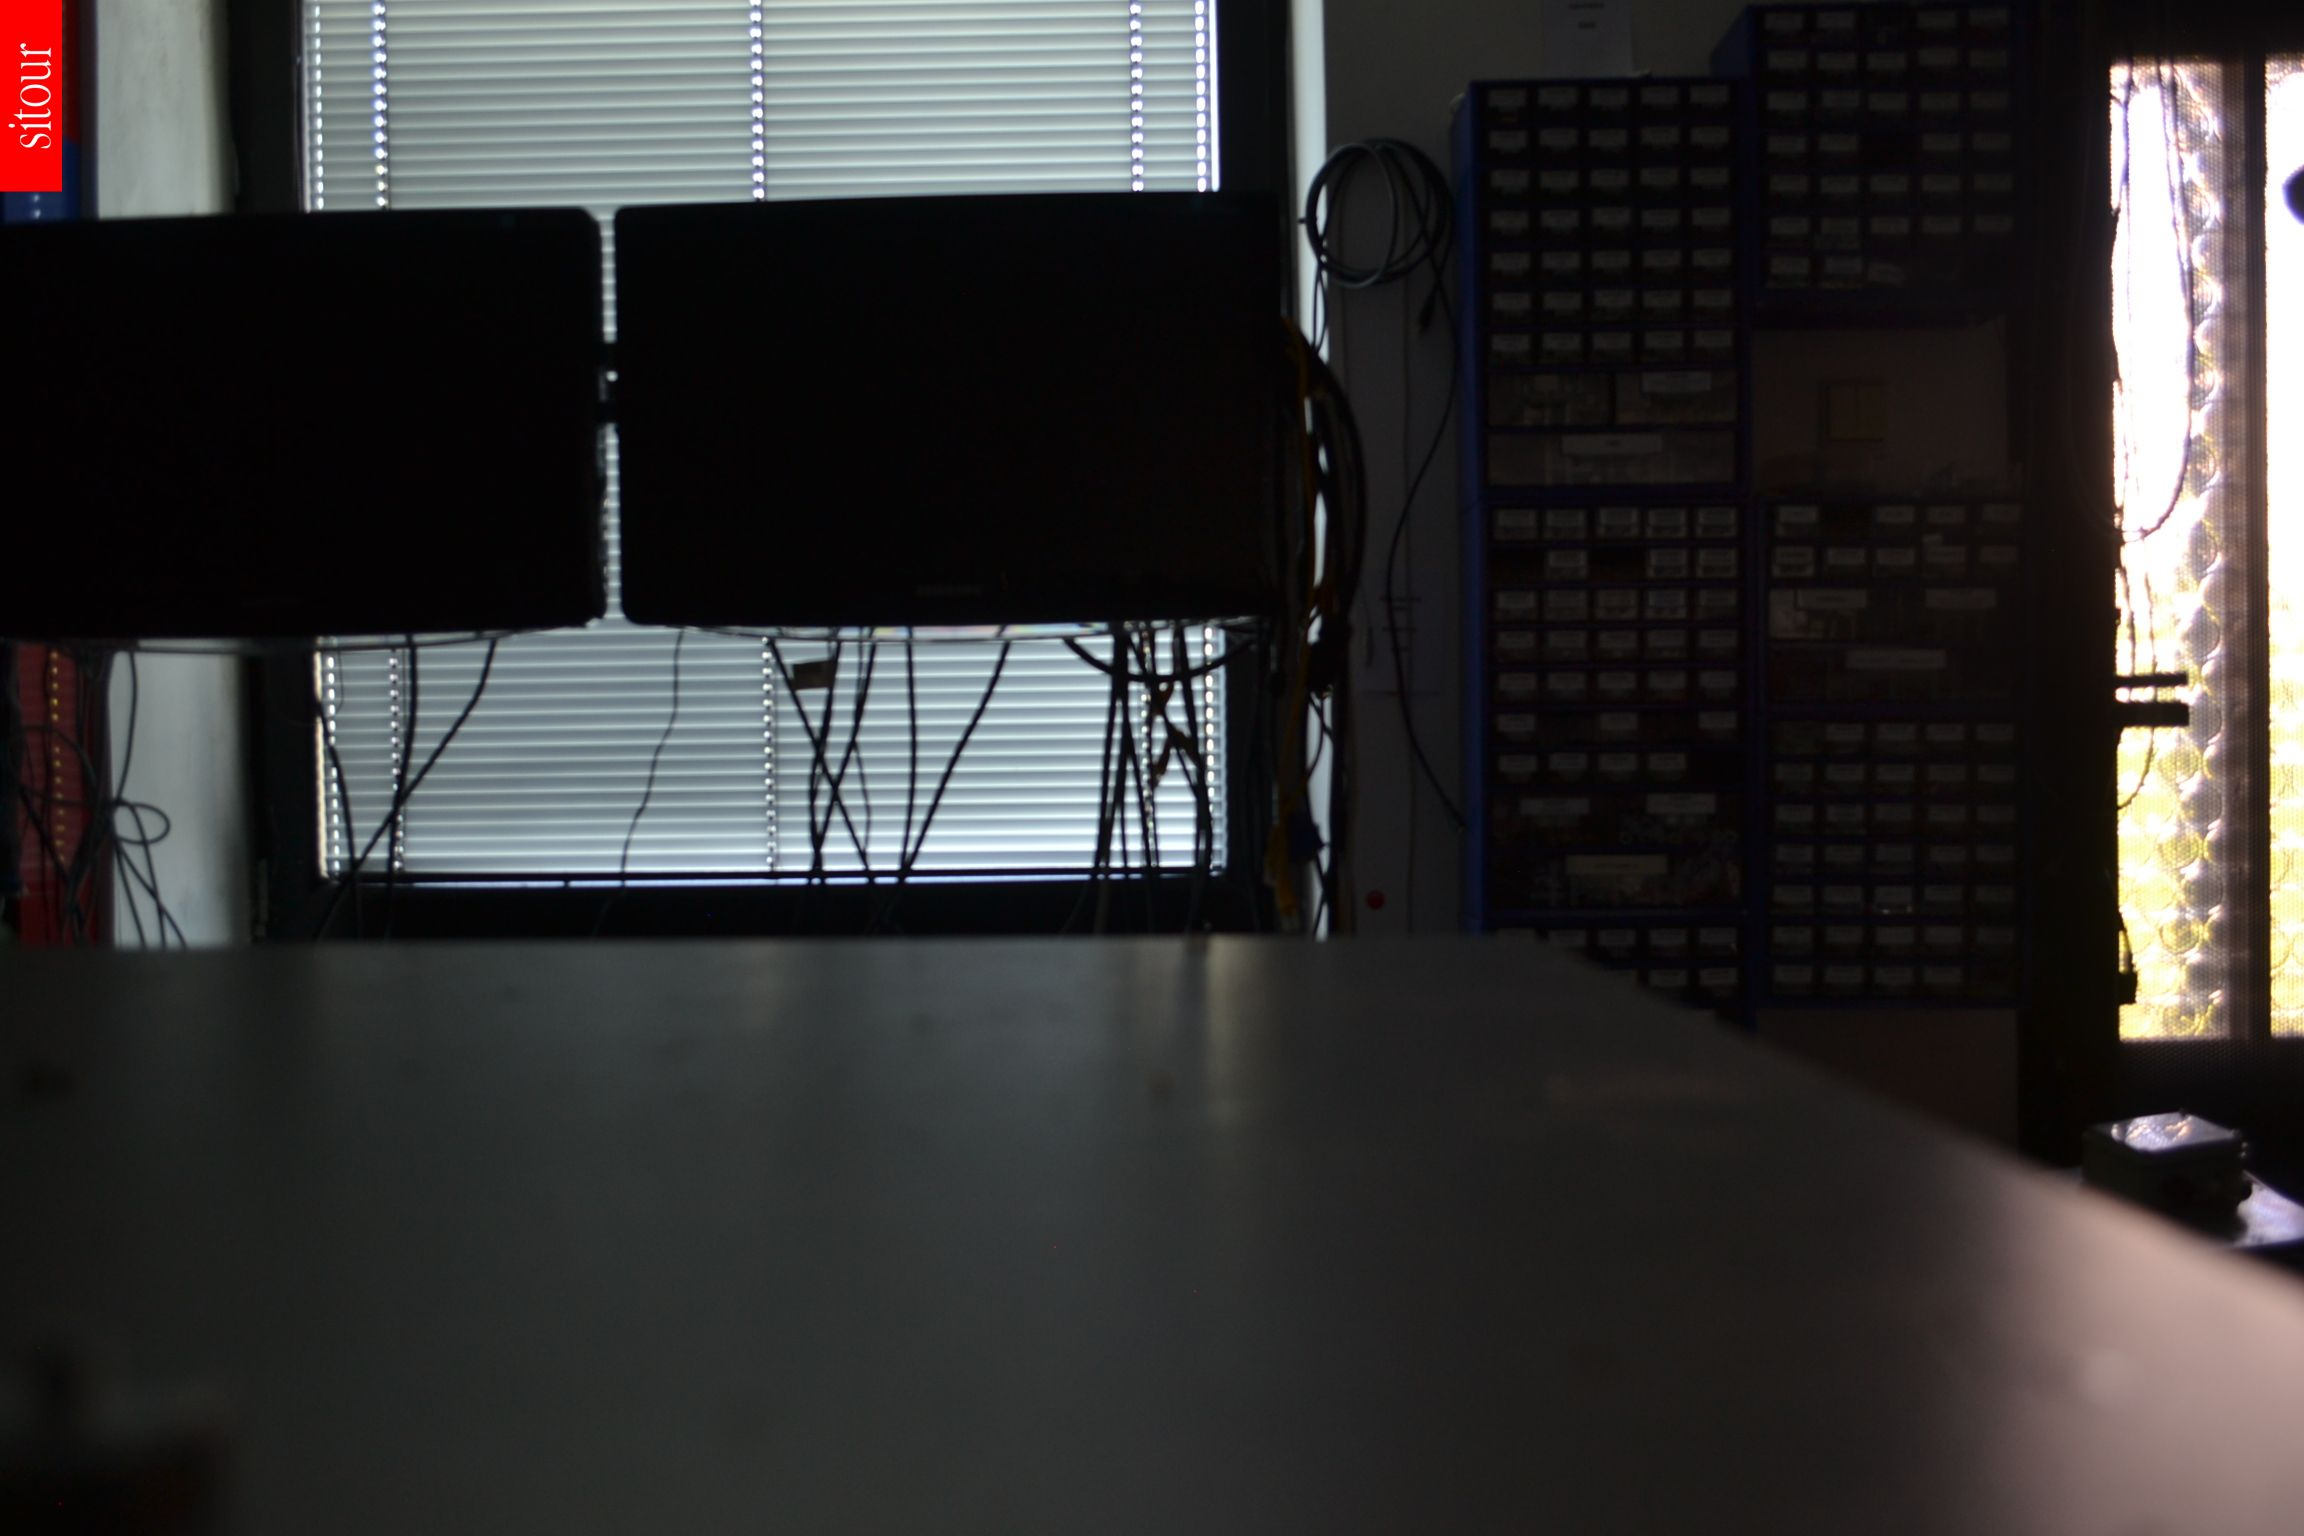 Webcam Ski Resort Rokytnice n. Jizerou cam 6 - Giant Mountains